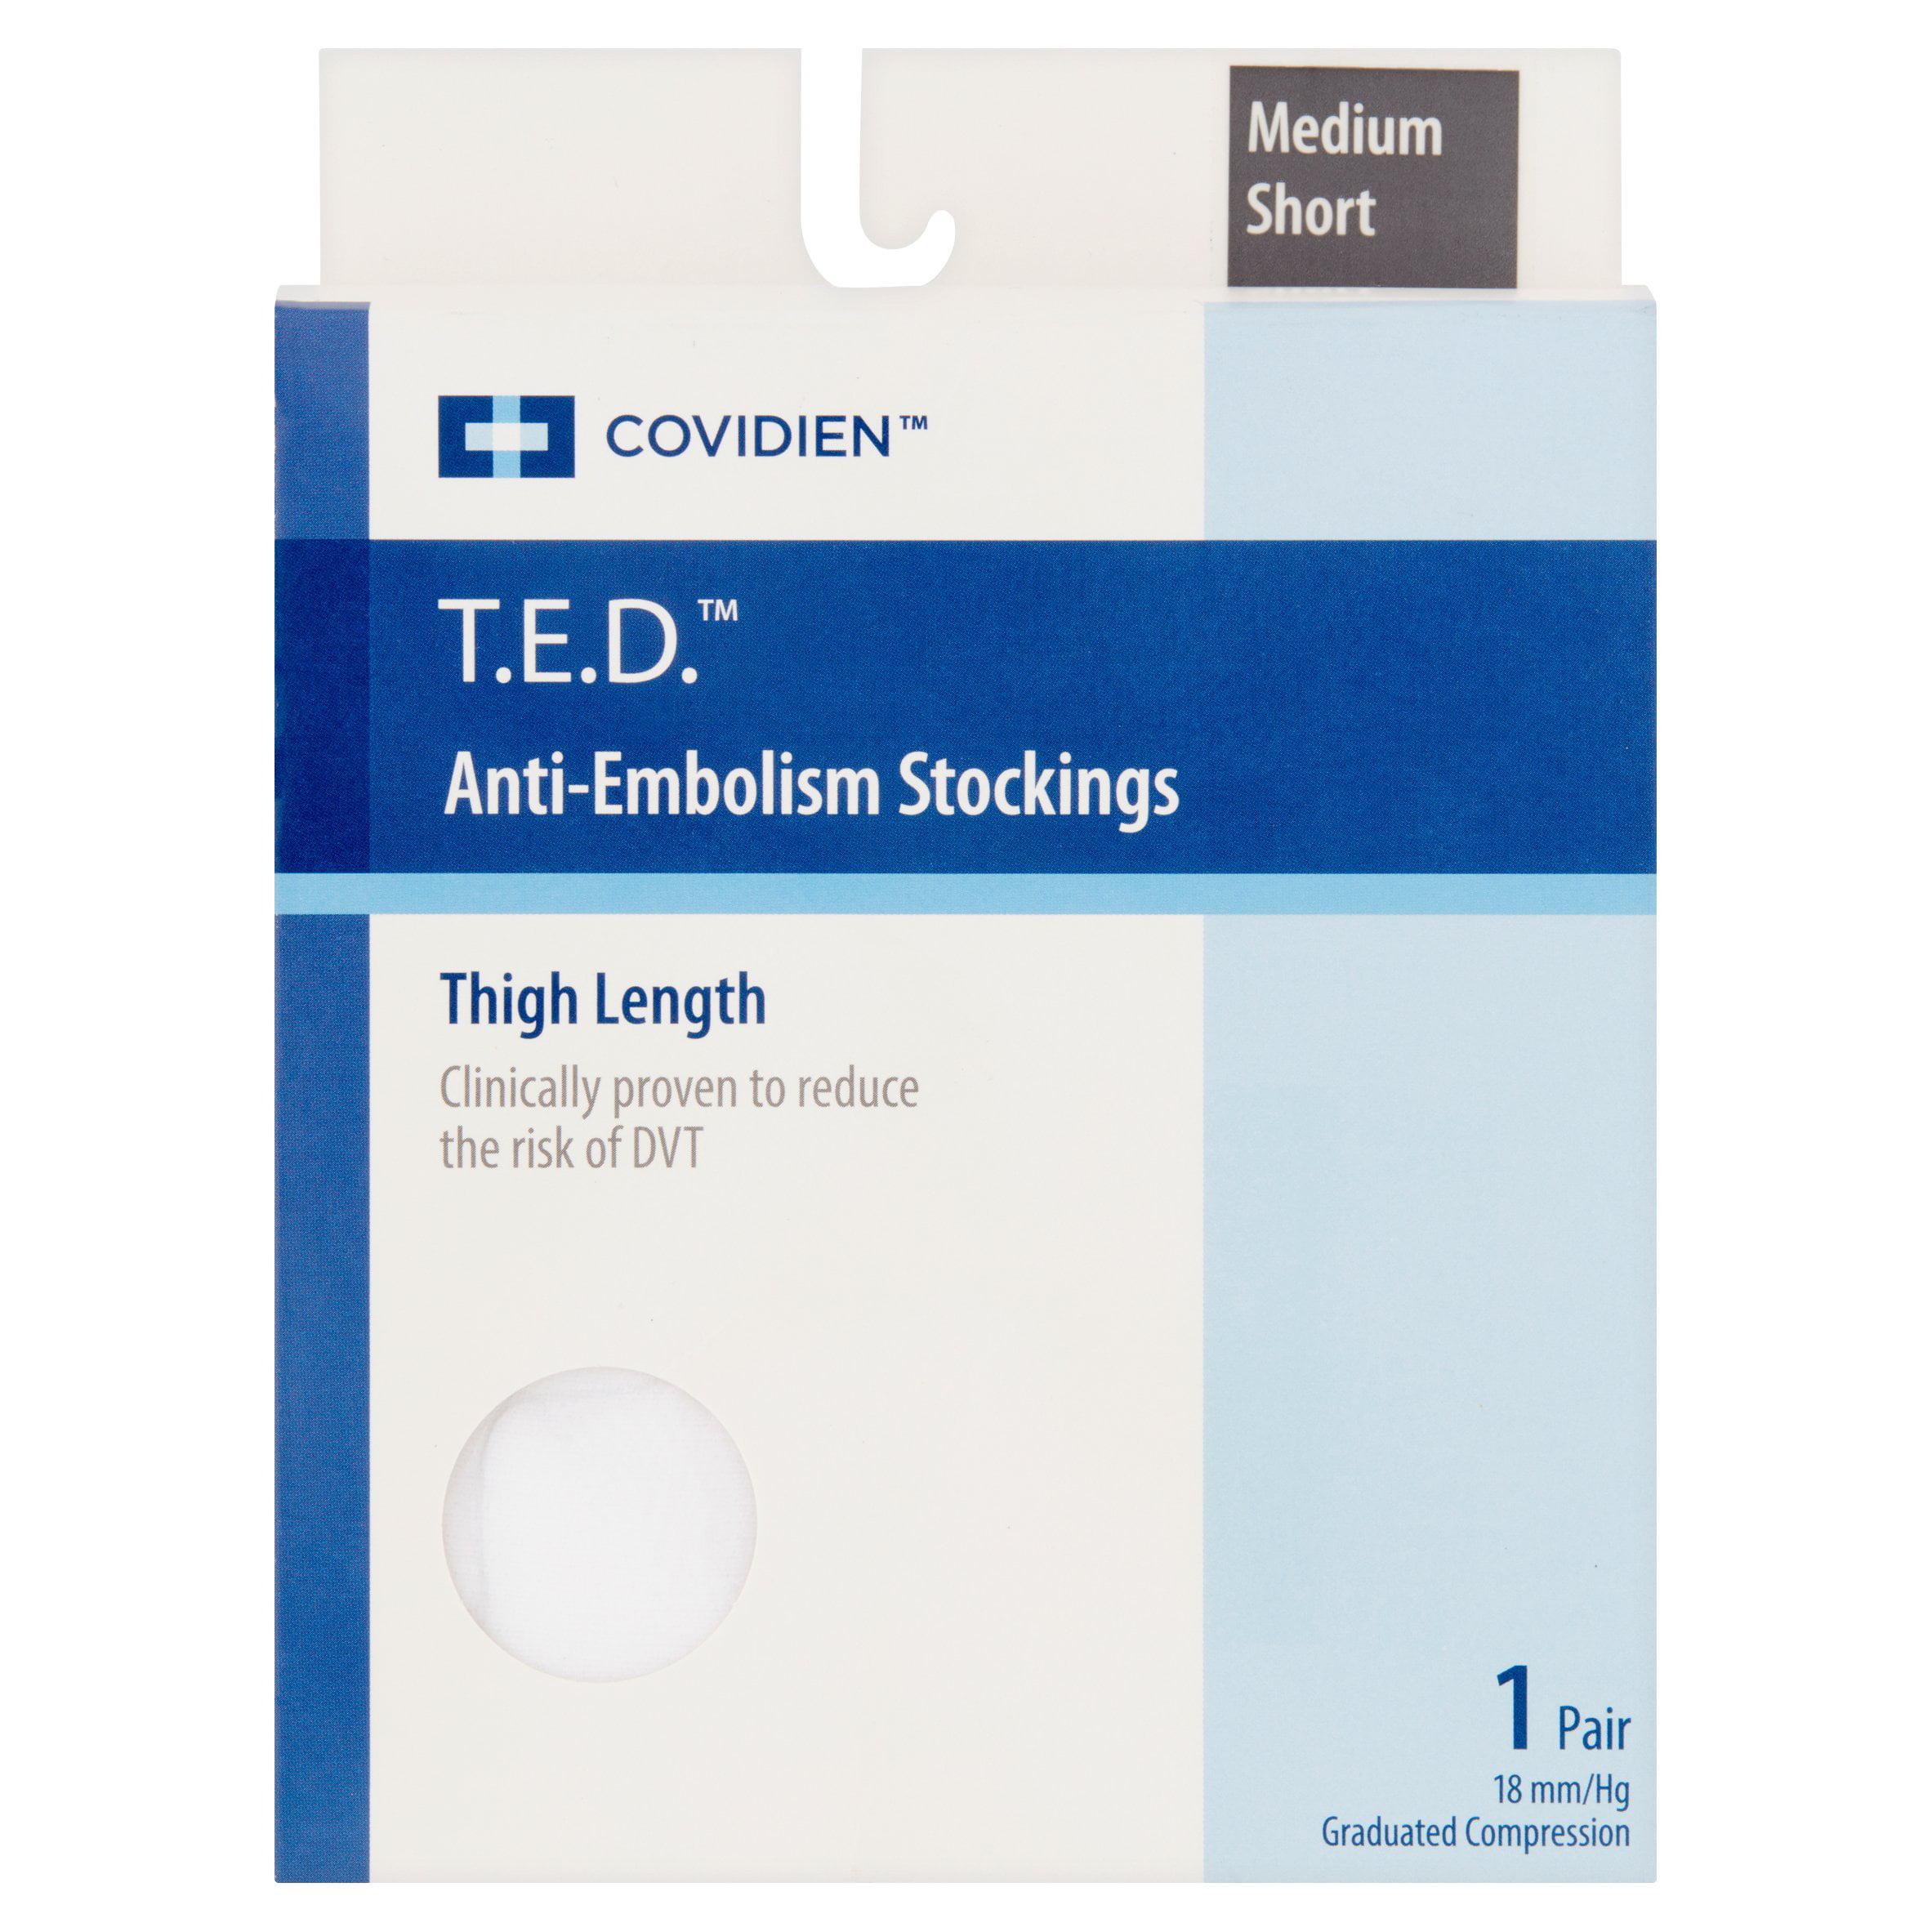 25cab70a20 Covidien T.E.D. Medium Short Anti Embolism Stockings Pair - Walmart.com